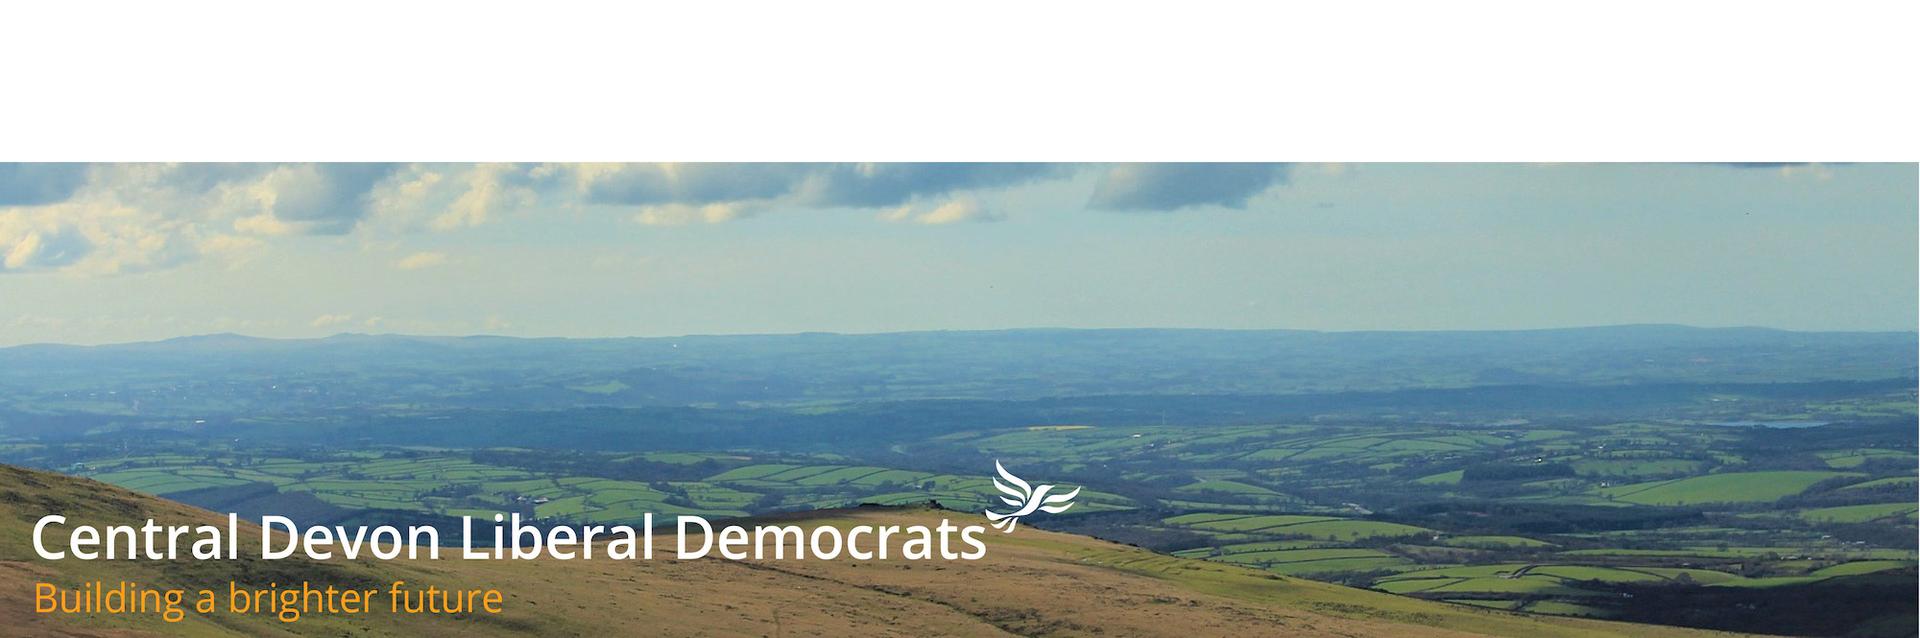 Central Devon Lib Dems